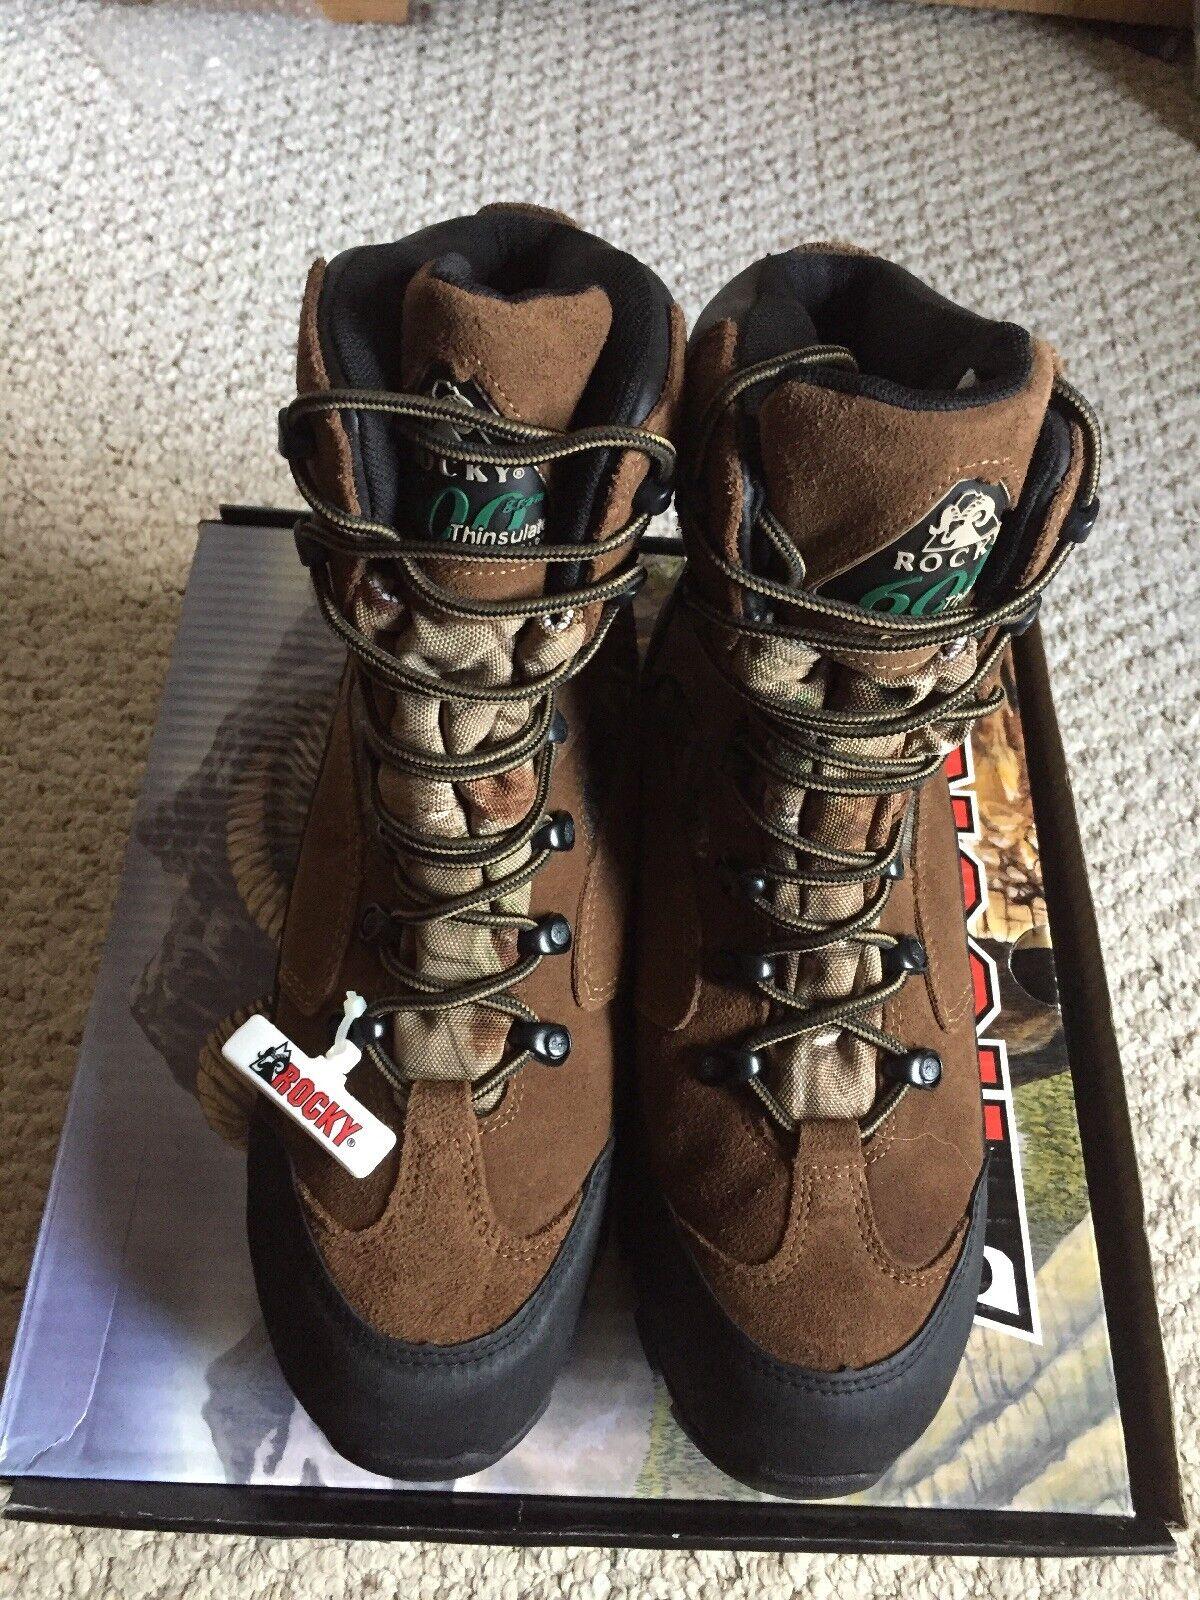 ROCKY Men's GORTEX WEATHERPROOF INSULATED Hunters Hikers Boot NIB